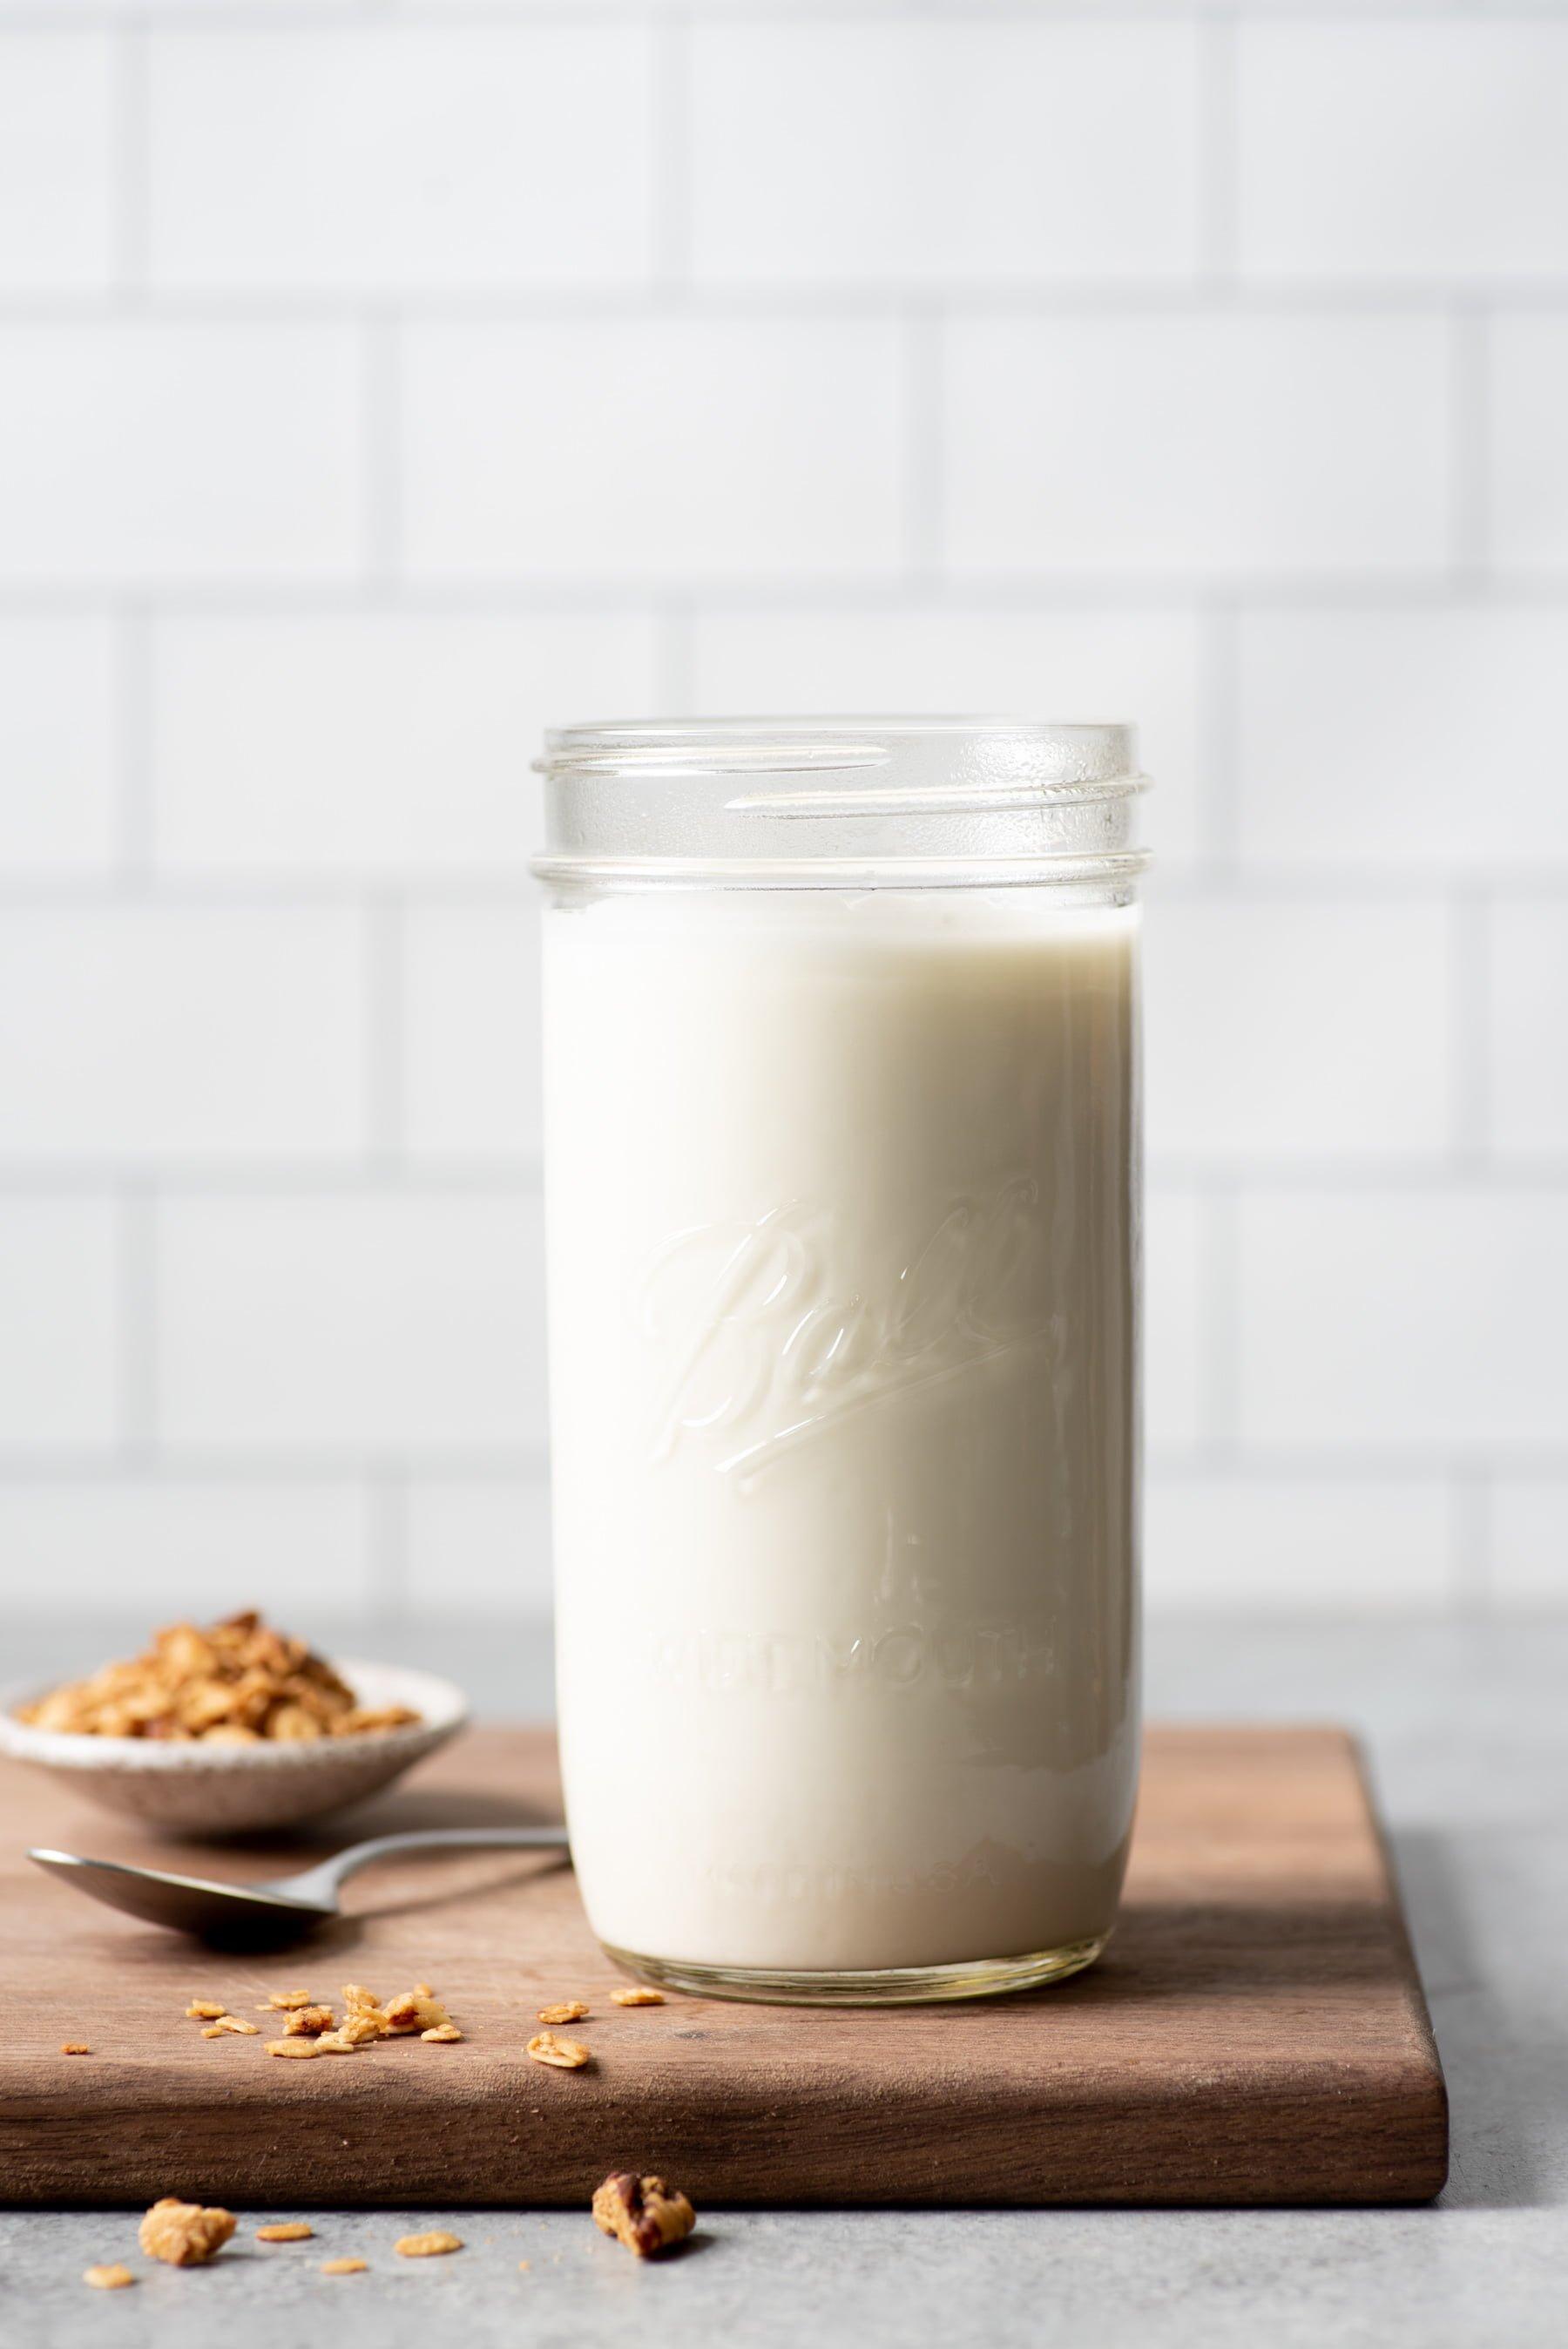 Homemade 24-hour yogurt in a glass jar